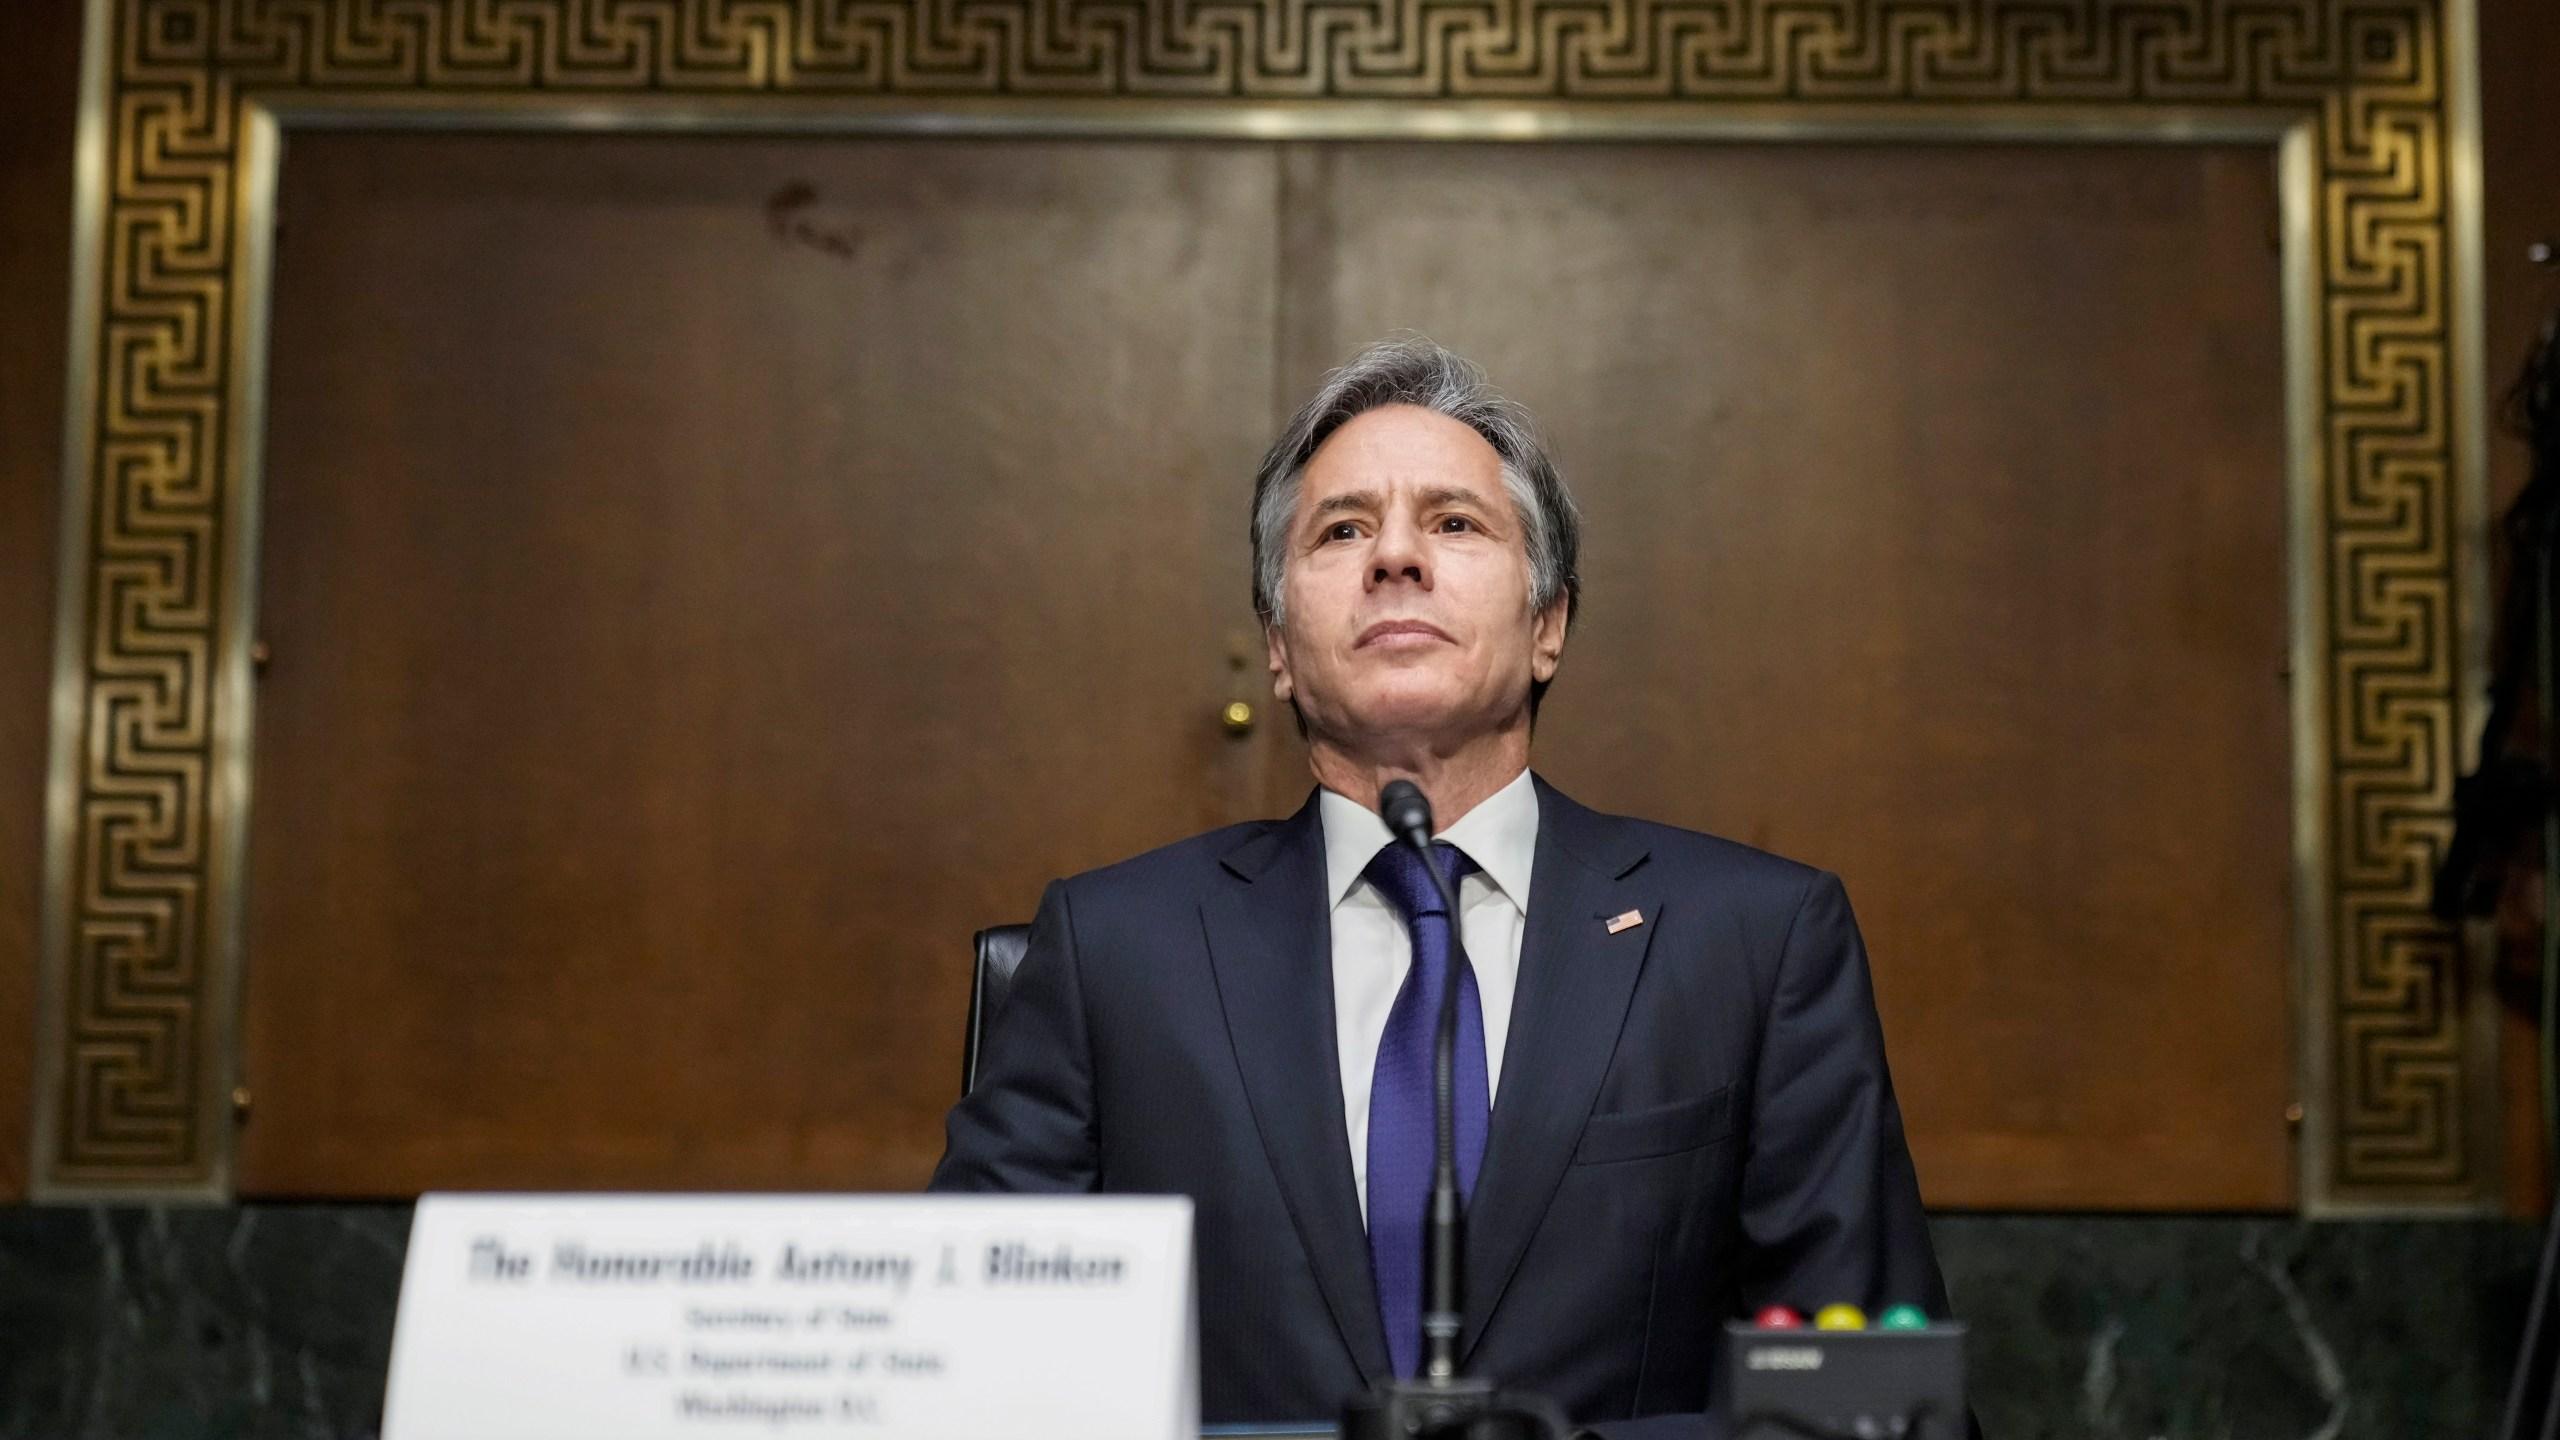 Antony Blinken, Secretary Of State Blinken Testifies Before Senate Foreign Relations Committee